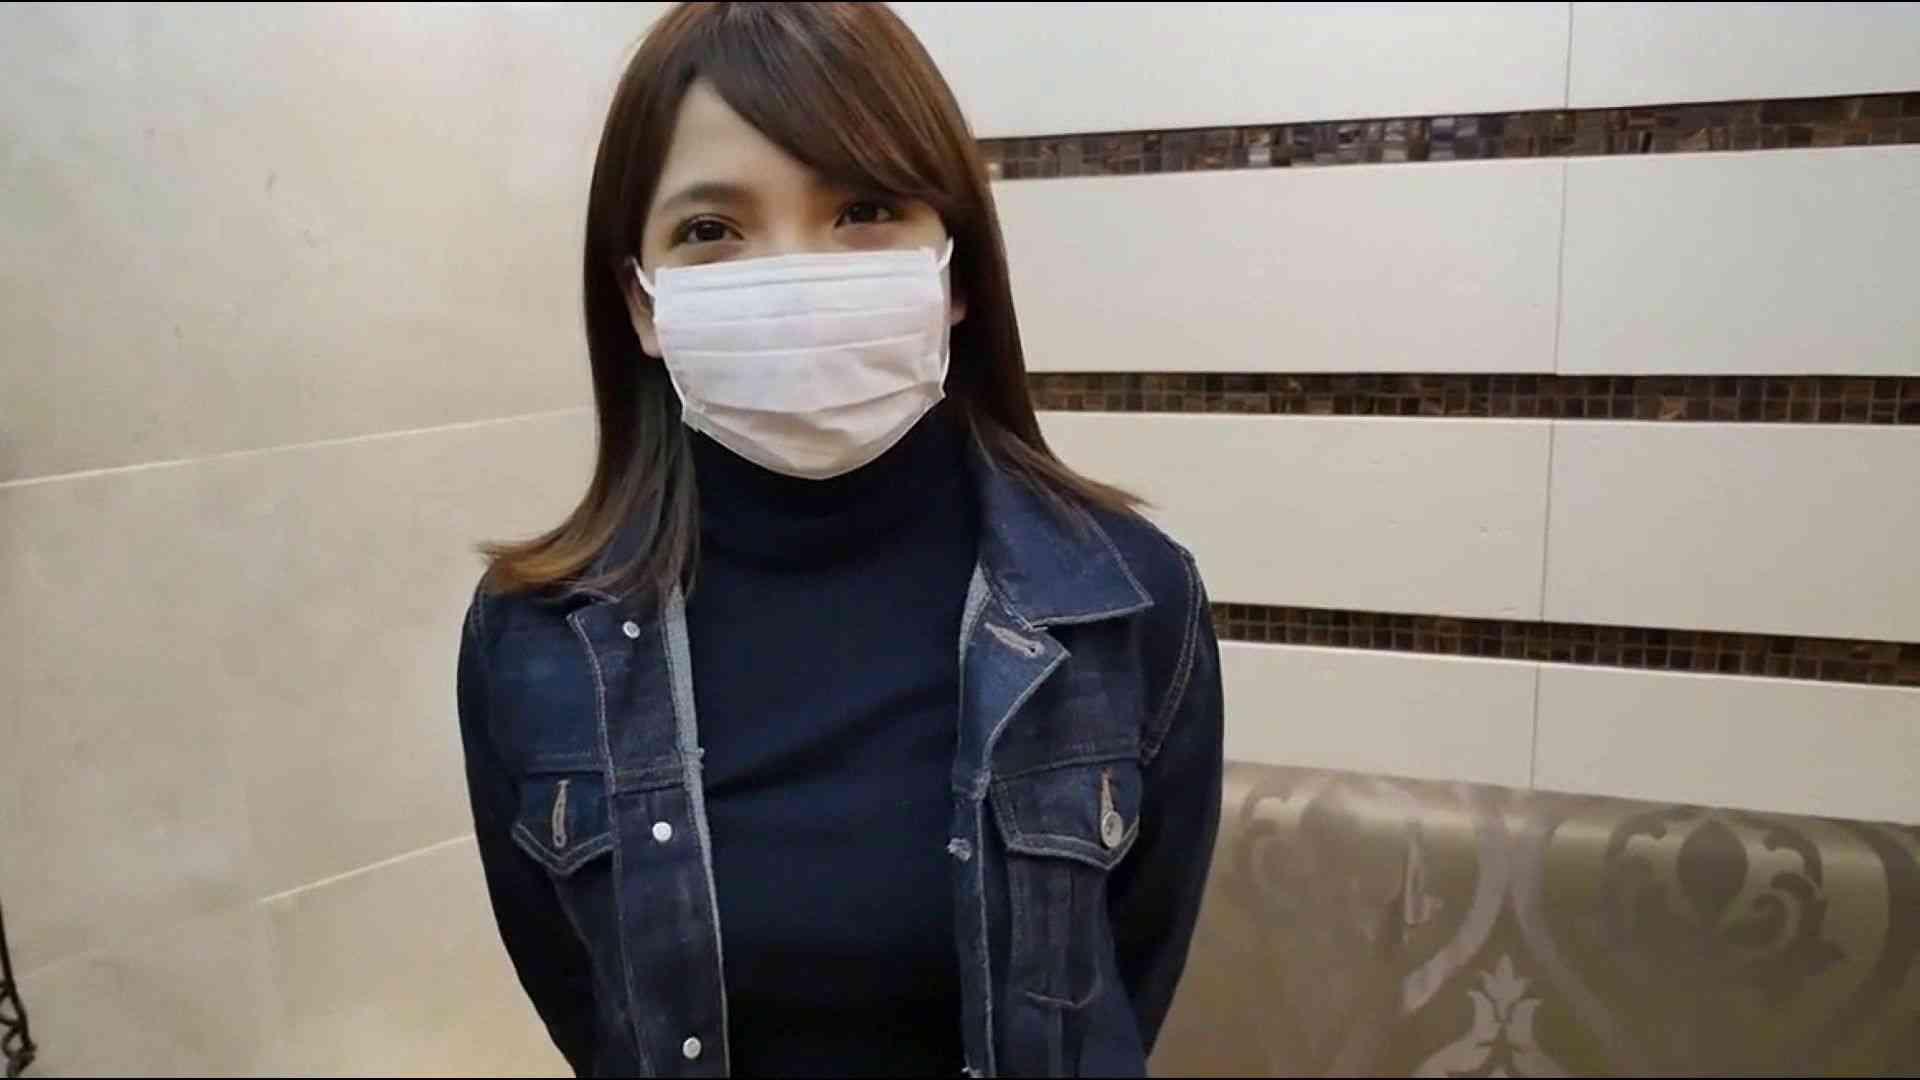 S級厳選美女ビッチガールVol.41 前編 OL女体   美女  105連発 3